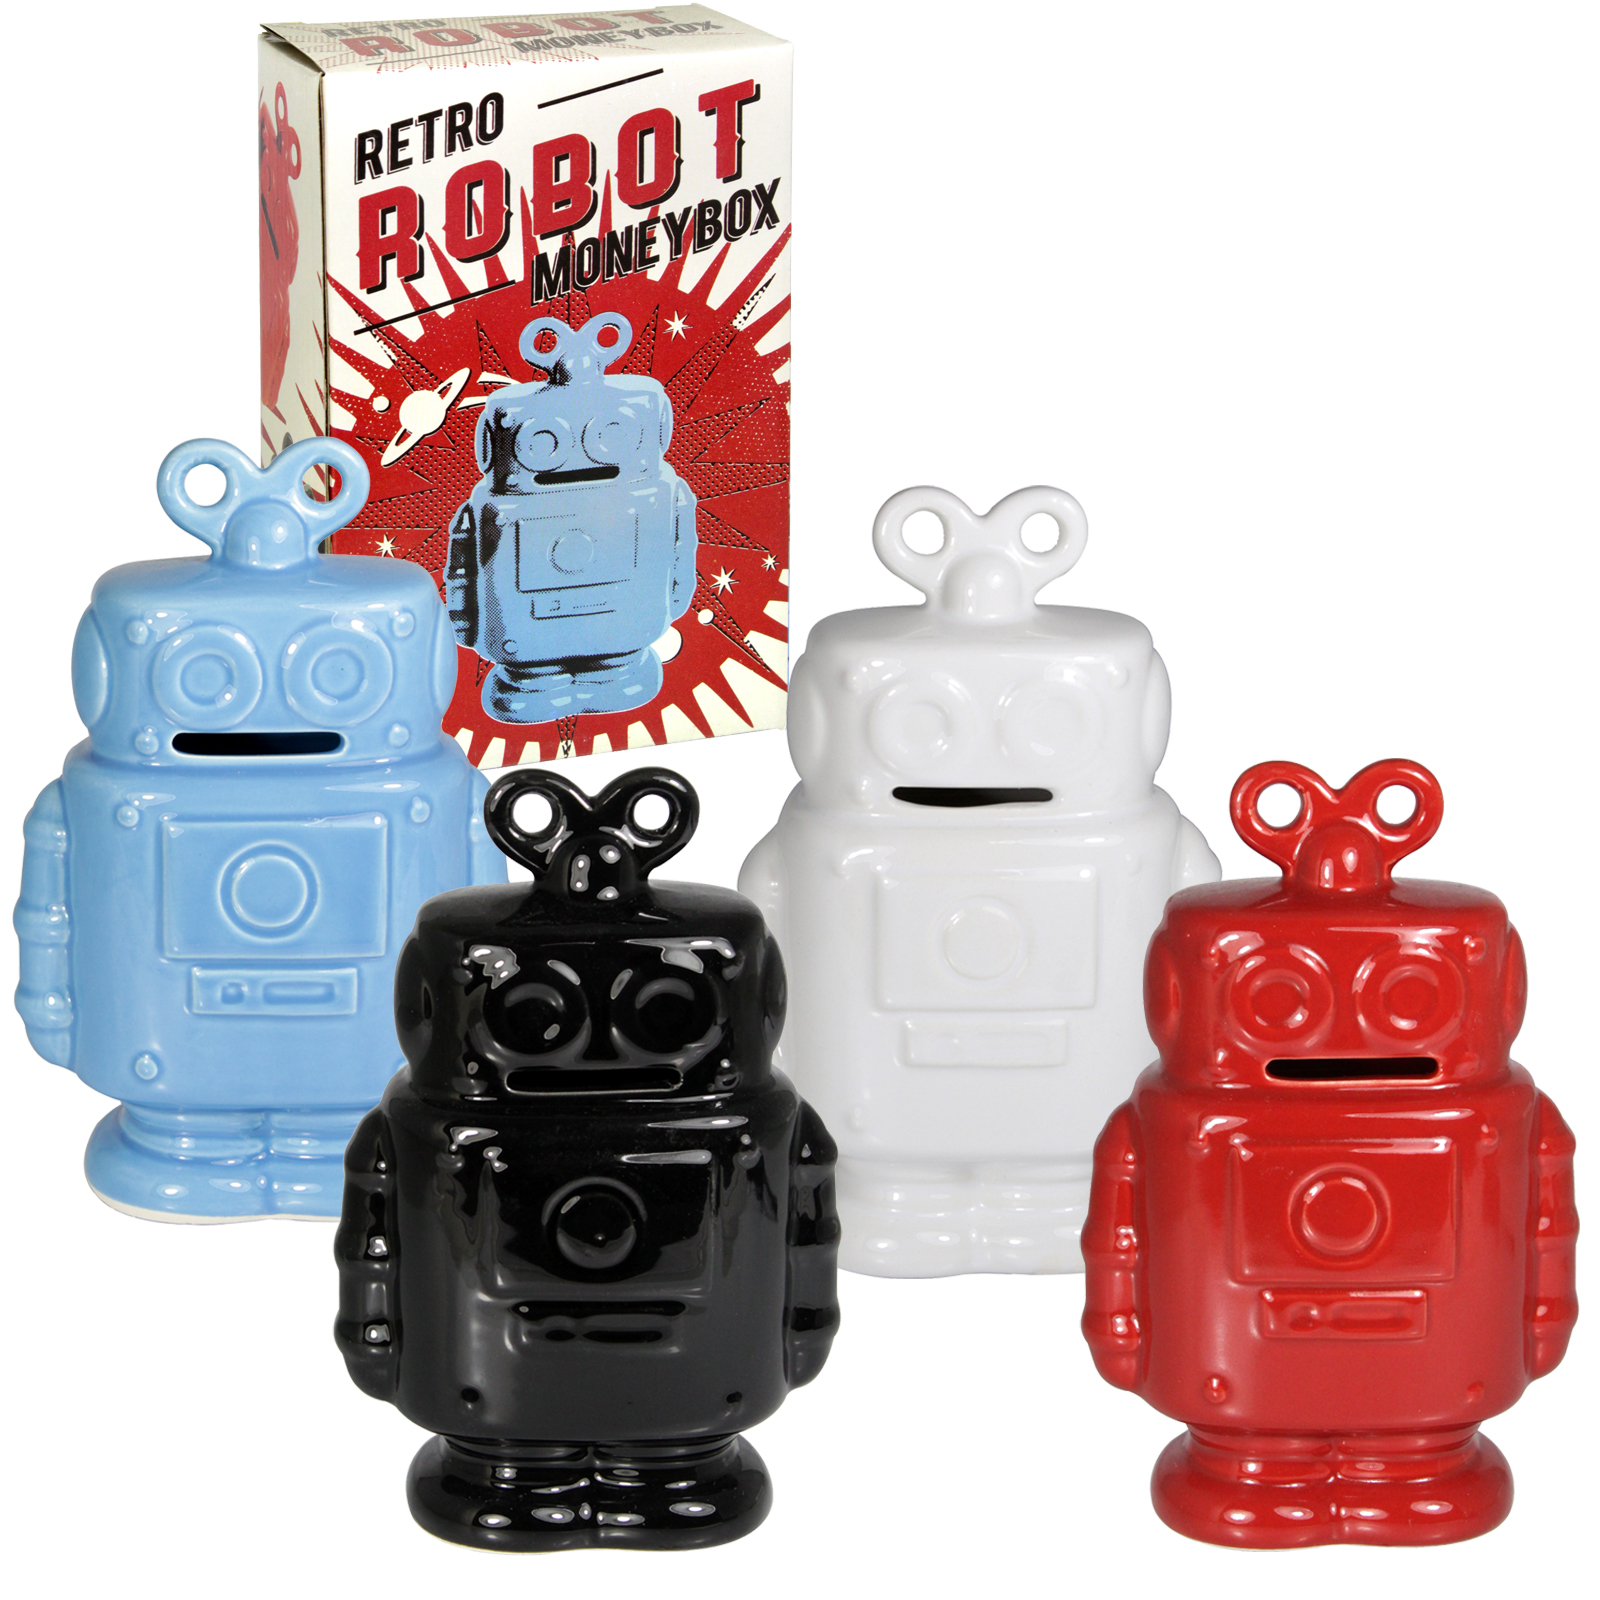 SIL MONEY BOX ROBOT 16CMX10CM